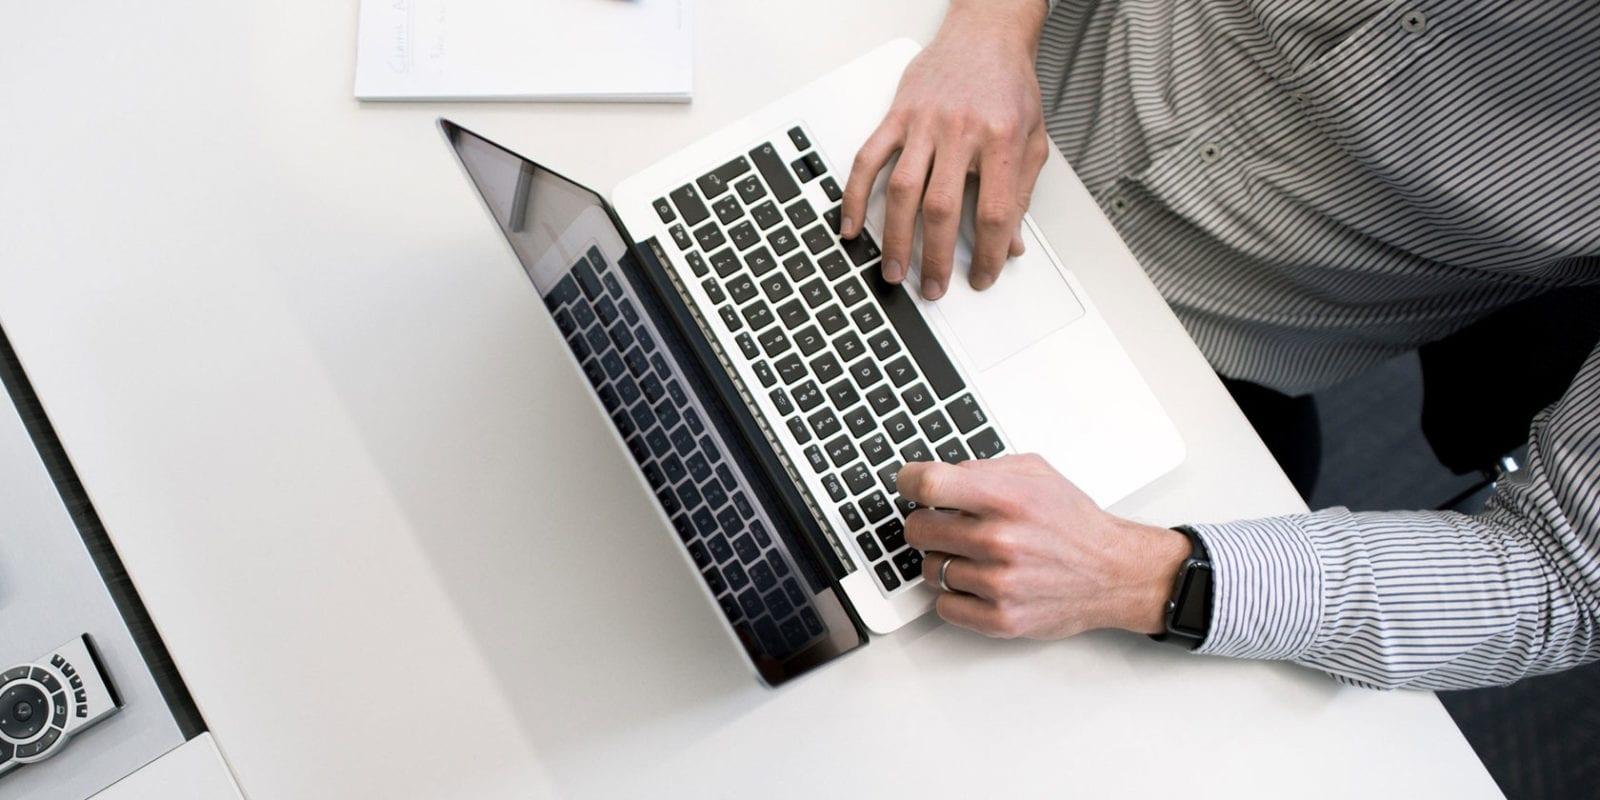 mac-terminal-cheatsheet